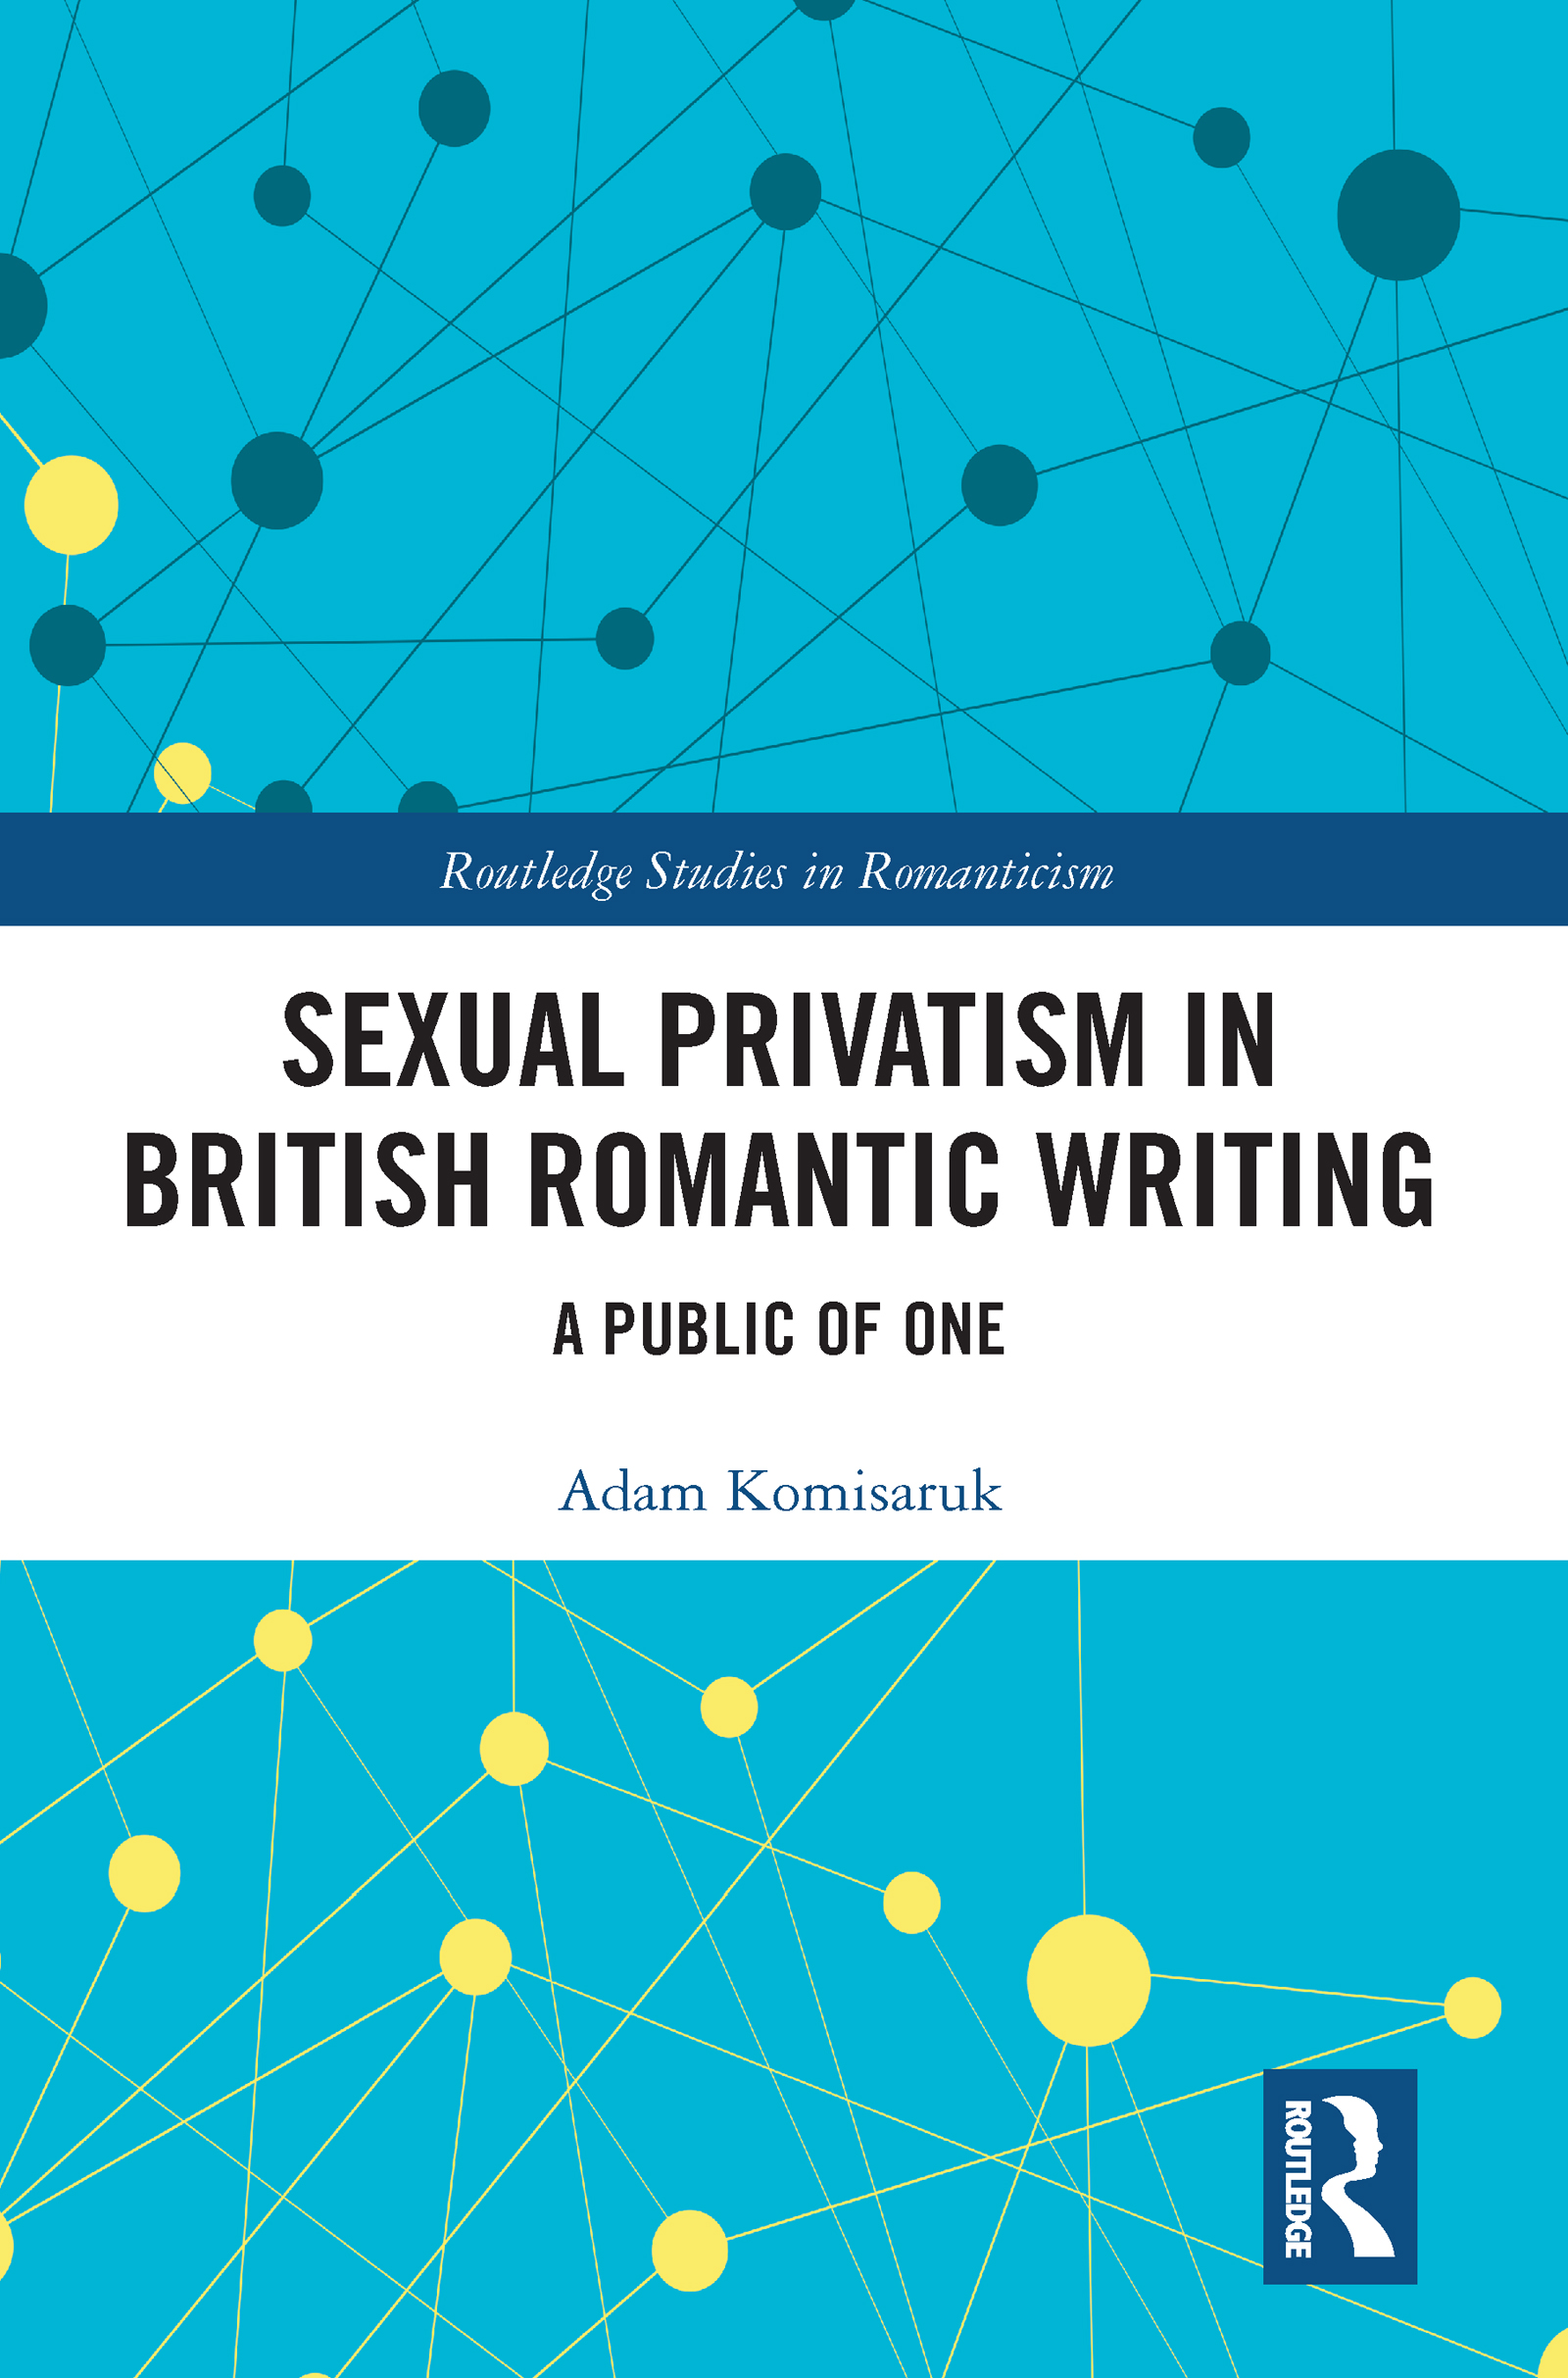 Sexual Privatism in British Romantic Writing